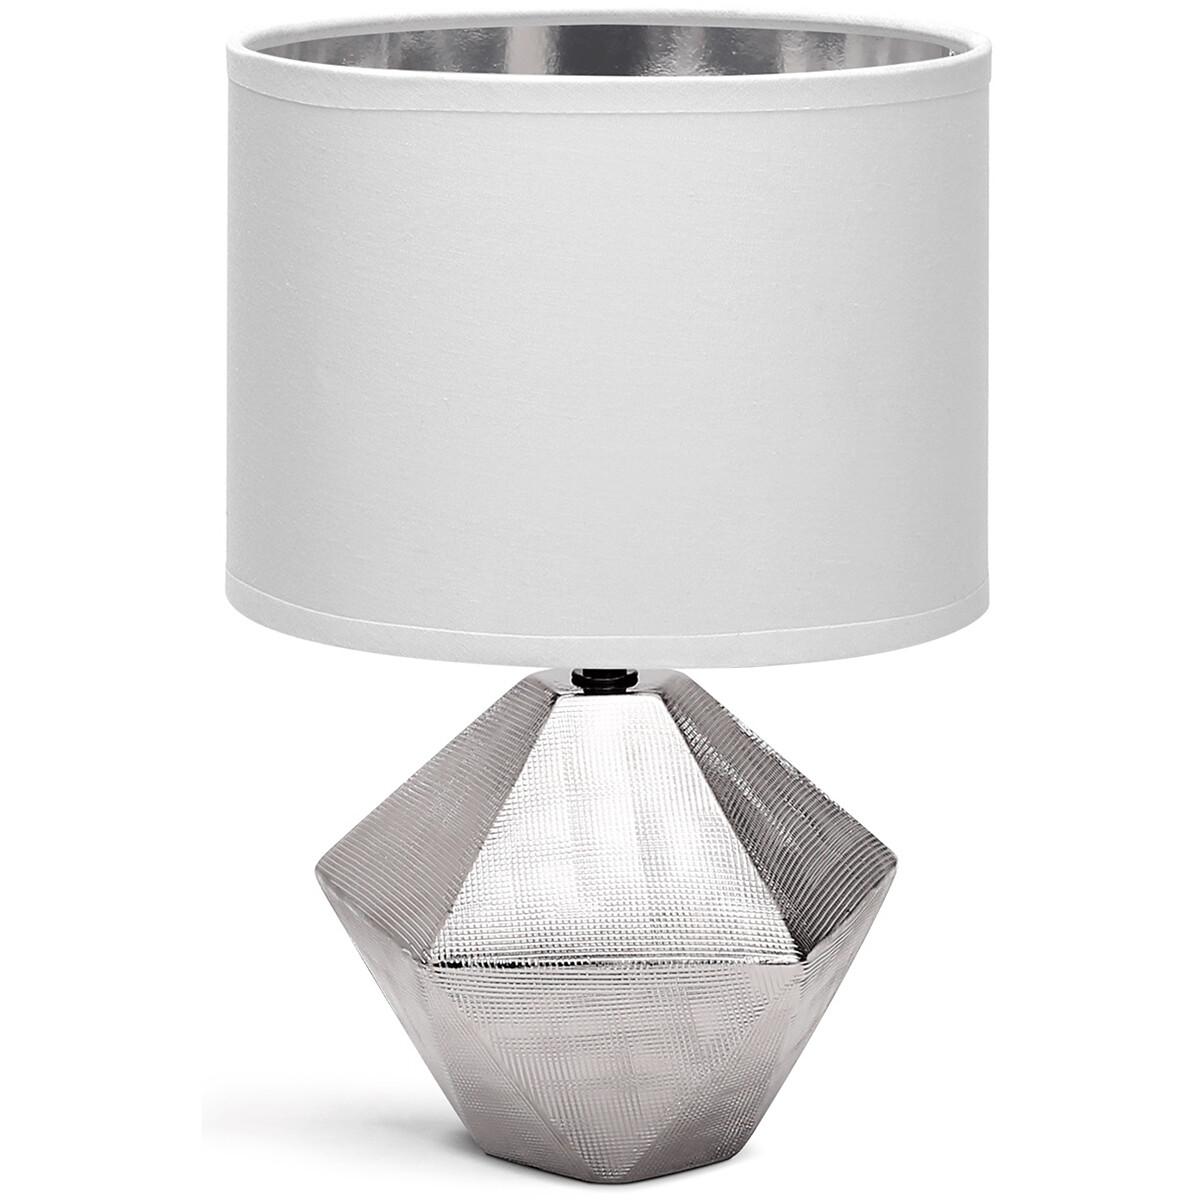 LED Tafellamp - Tafelverlichting - Aigi Uynimo XL - E14 Fitting - Rond - Mat Wit/Zilver - Keramiek